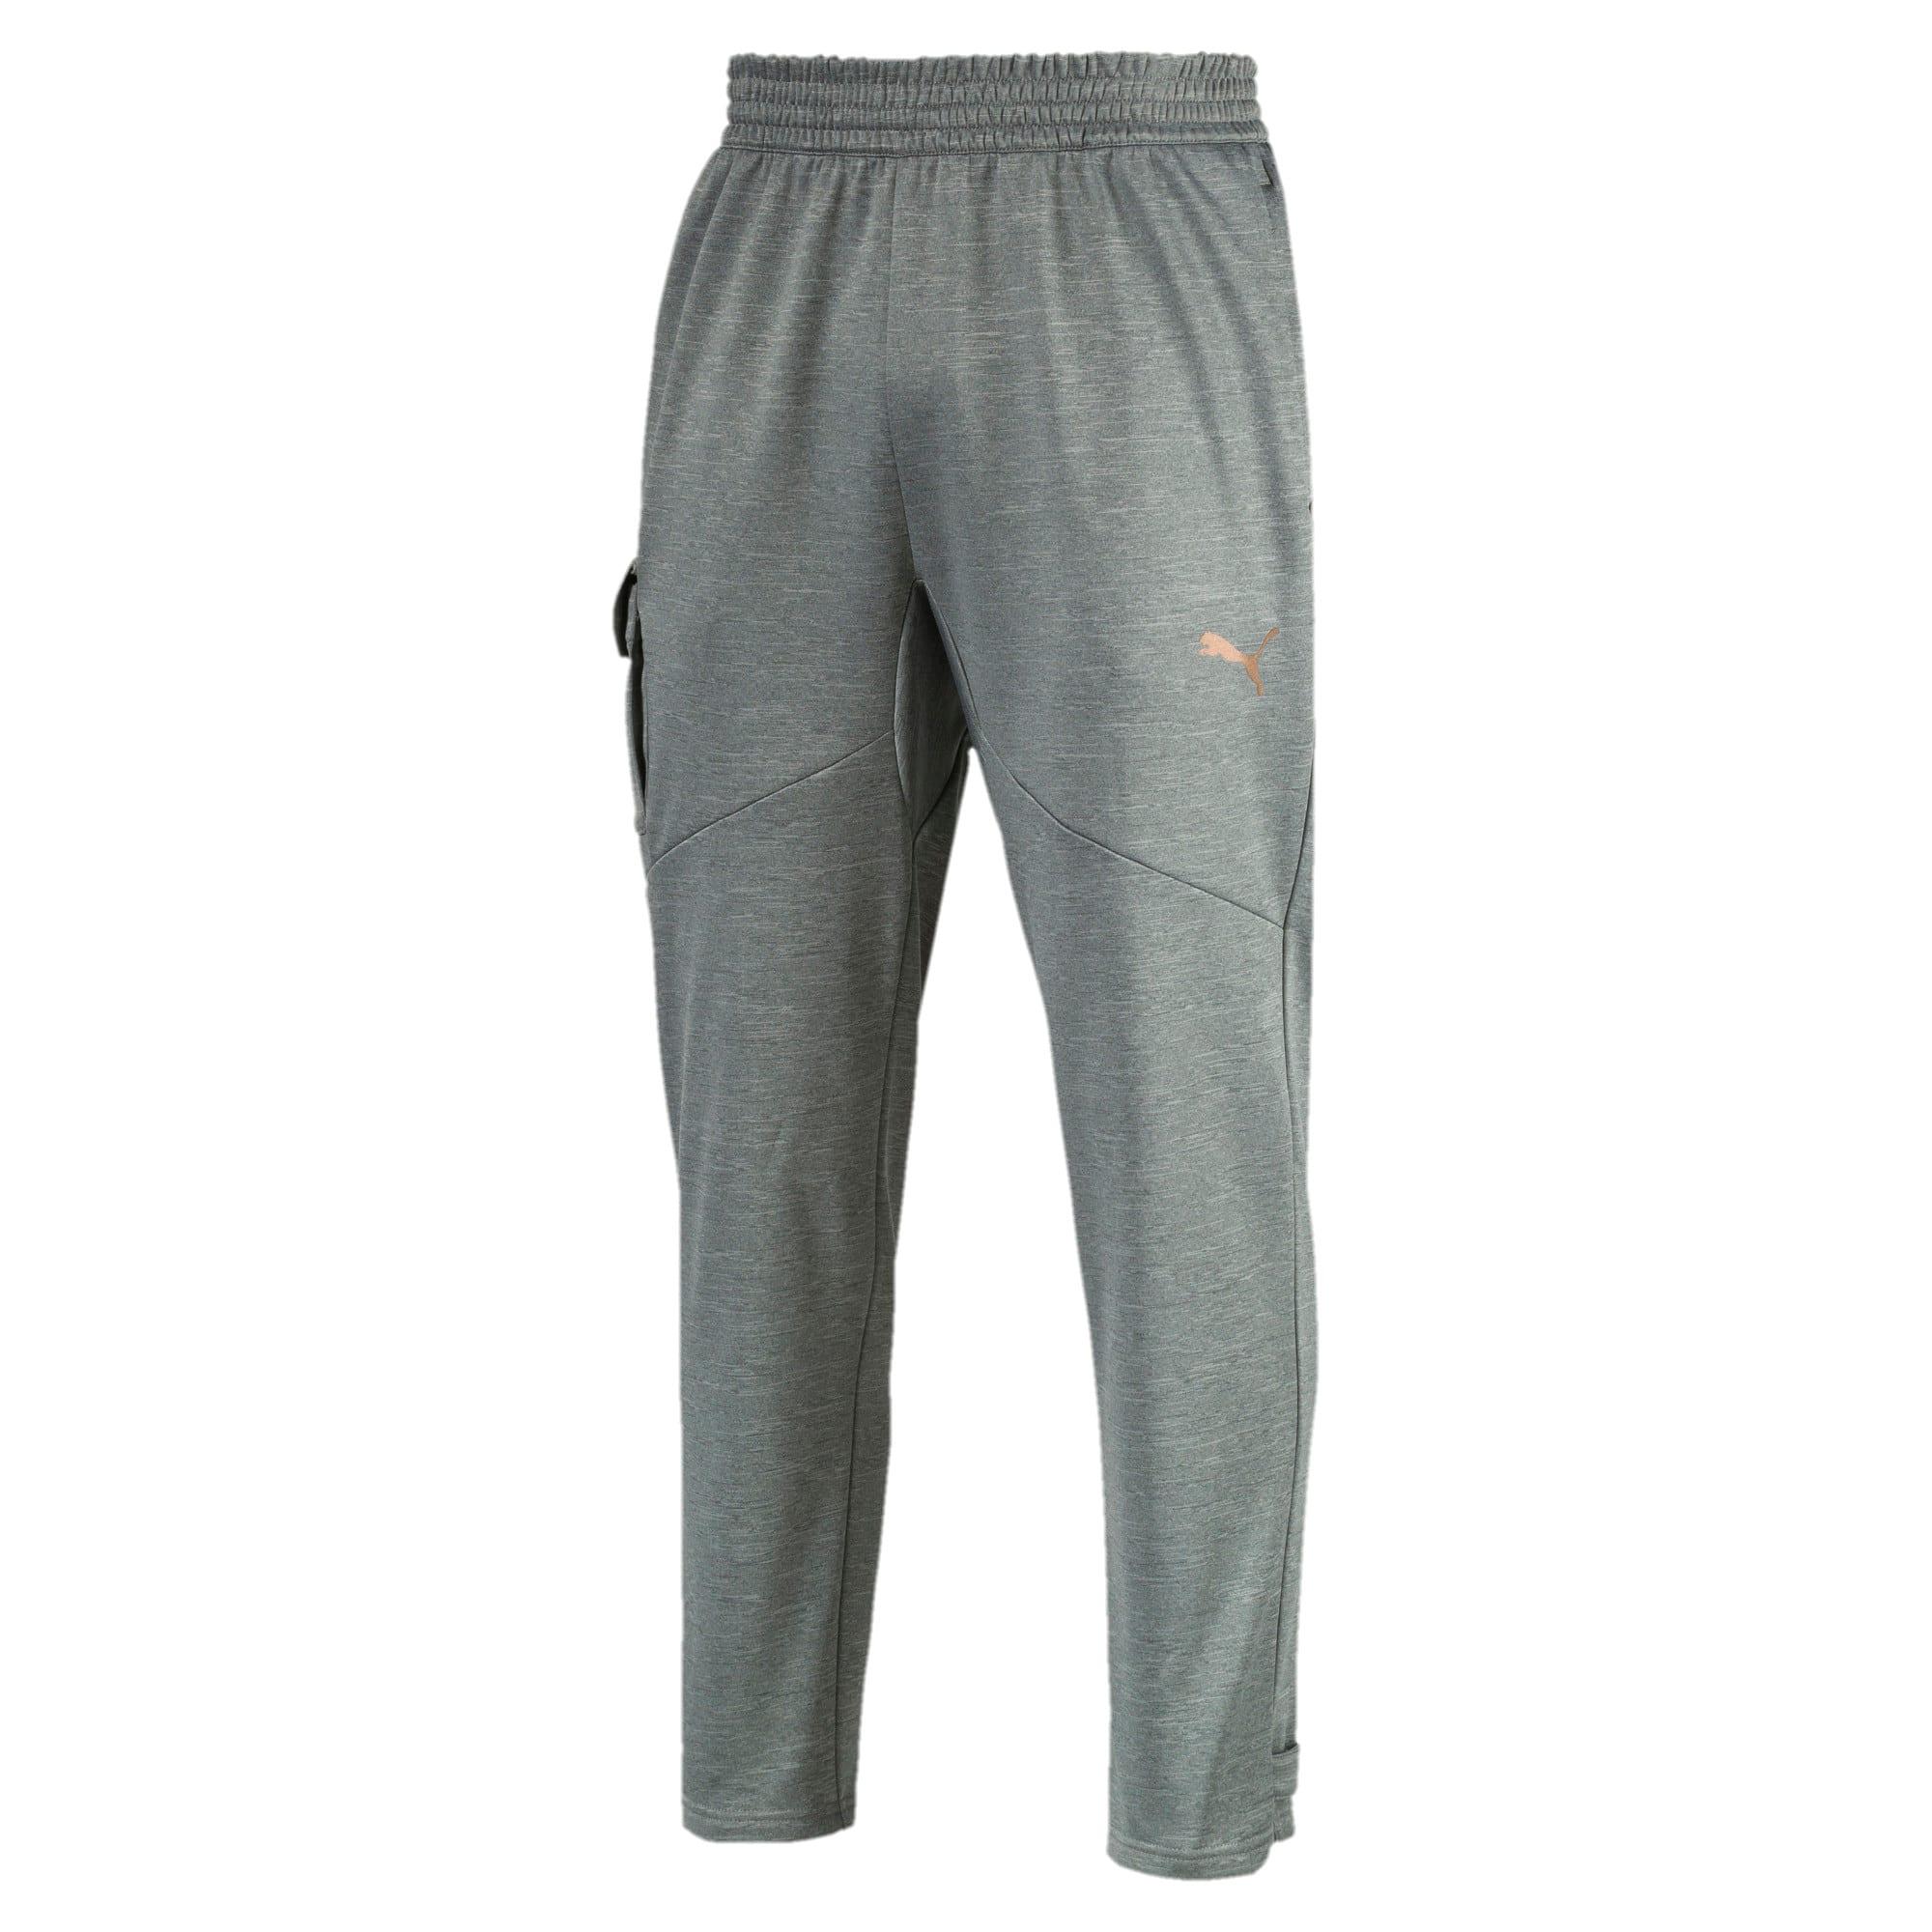 Thumbnail 1 of BND Tech Trackster Men's Sweatpants, Medium Gray Heather, medium